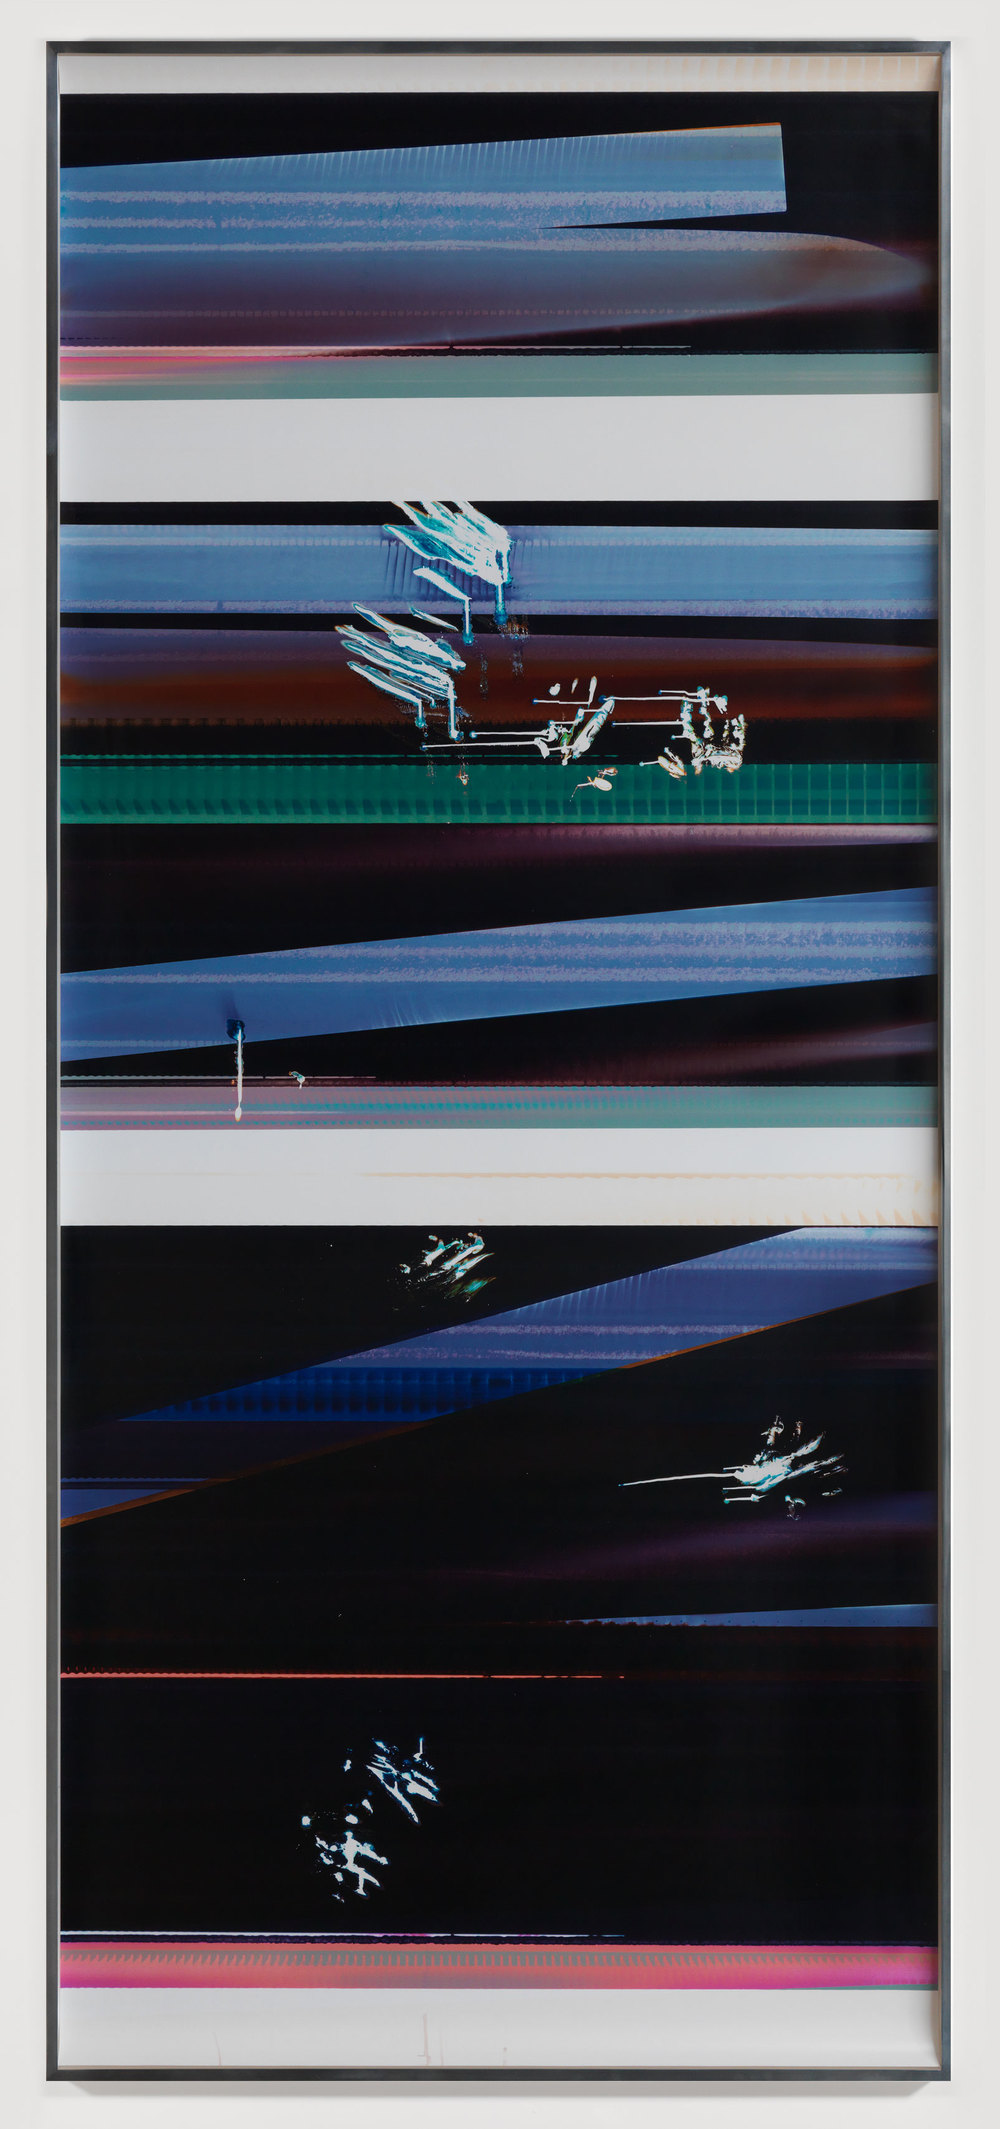 Cross-Contaminated RA4 Contact Print [Black Curl (9:6/YMC/Six Magnet: Los Angeles, California, August 13, 2014, Fujicolor Crystal Archive Super Type C, Em. No. 112-012, Kodak Ektacolor RA Bleach-Fix and Replenisher, Cat. No. 847 1484, 81414), Kreonite KM IV 5225 RA4 Color Processor, Ser. No. 00092174]    2014   Color photographic paper  116 1/4 x 50 inches   Gastarbeiten, 2014